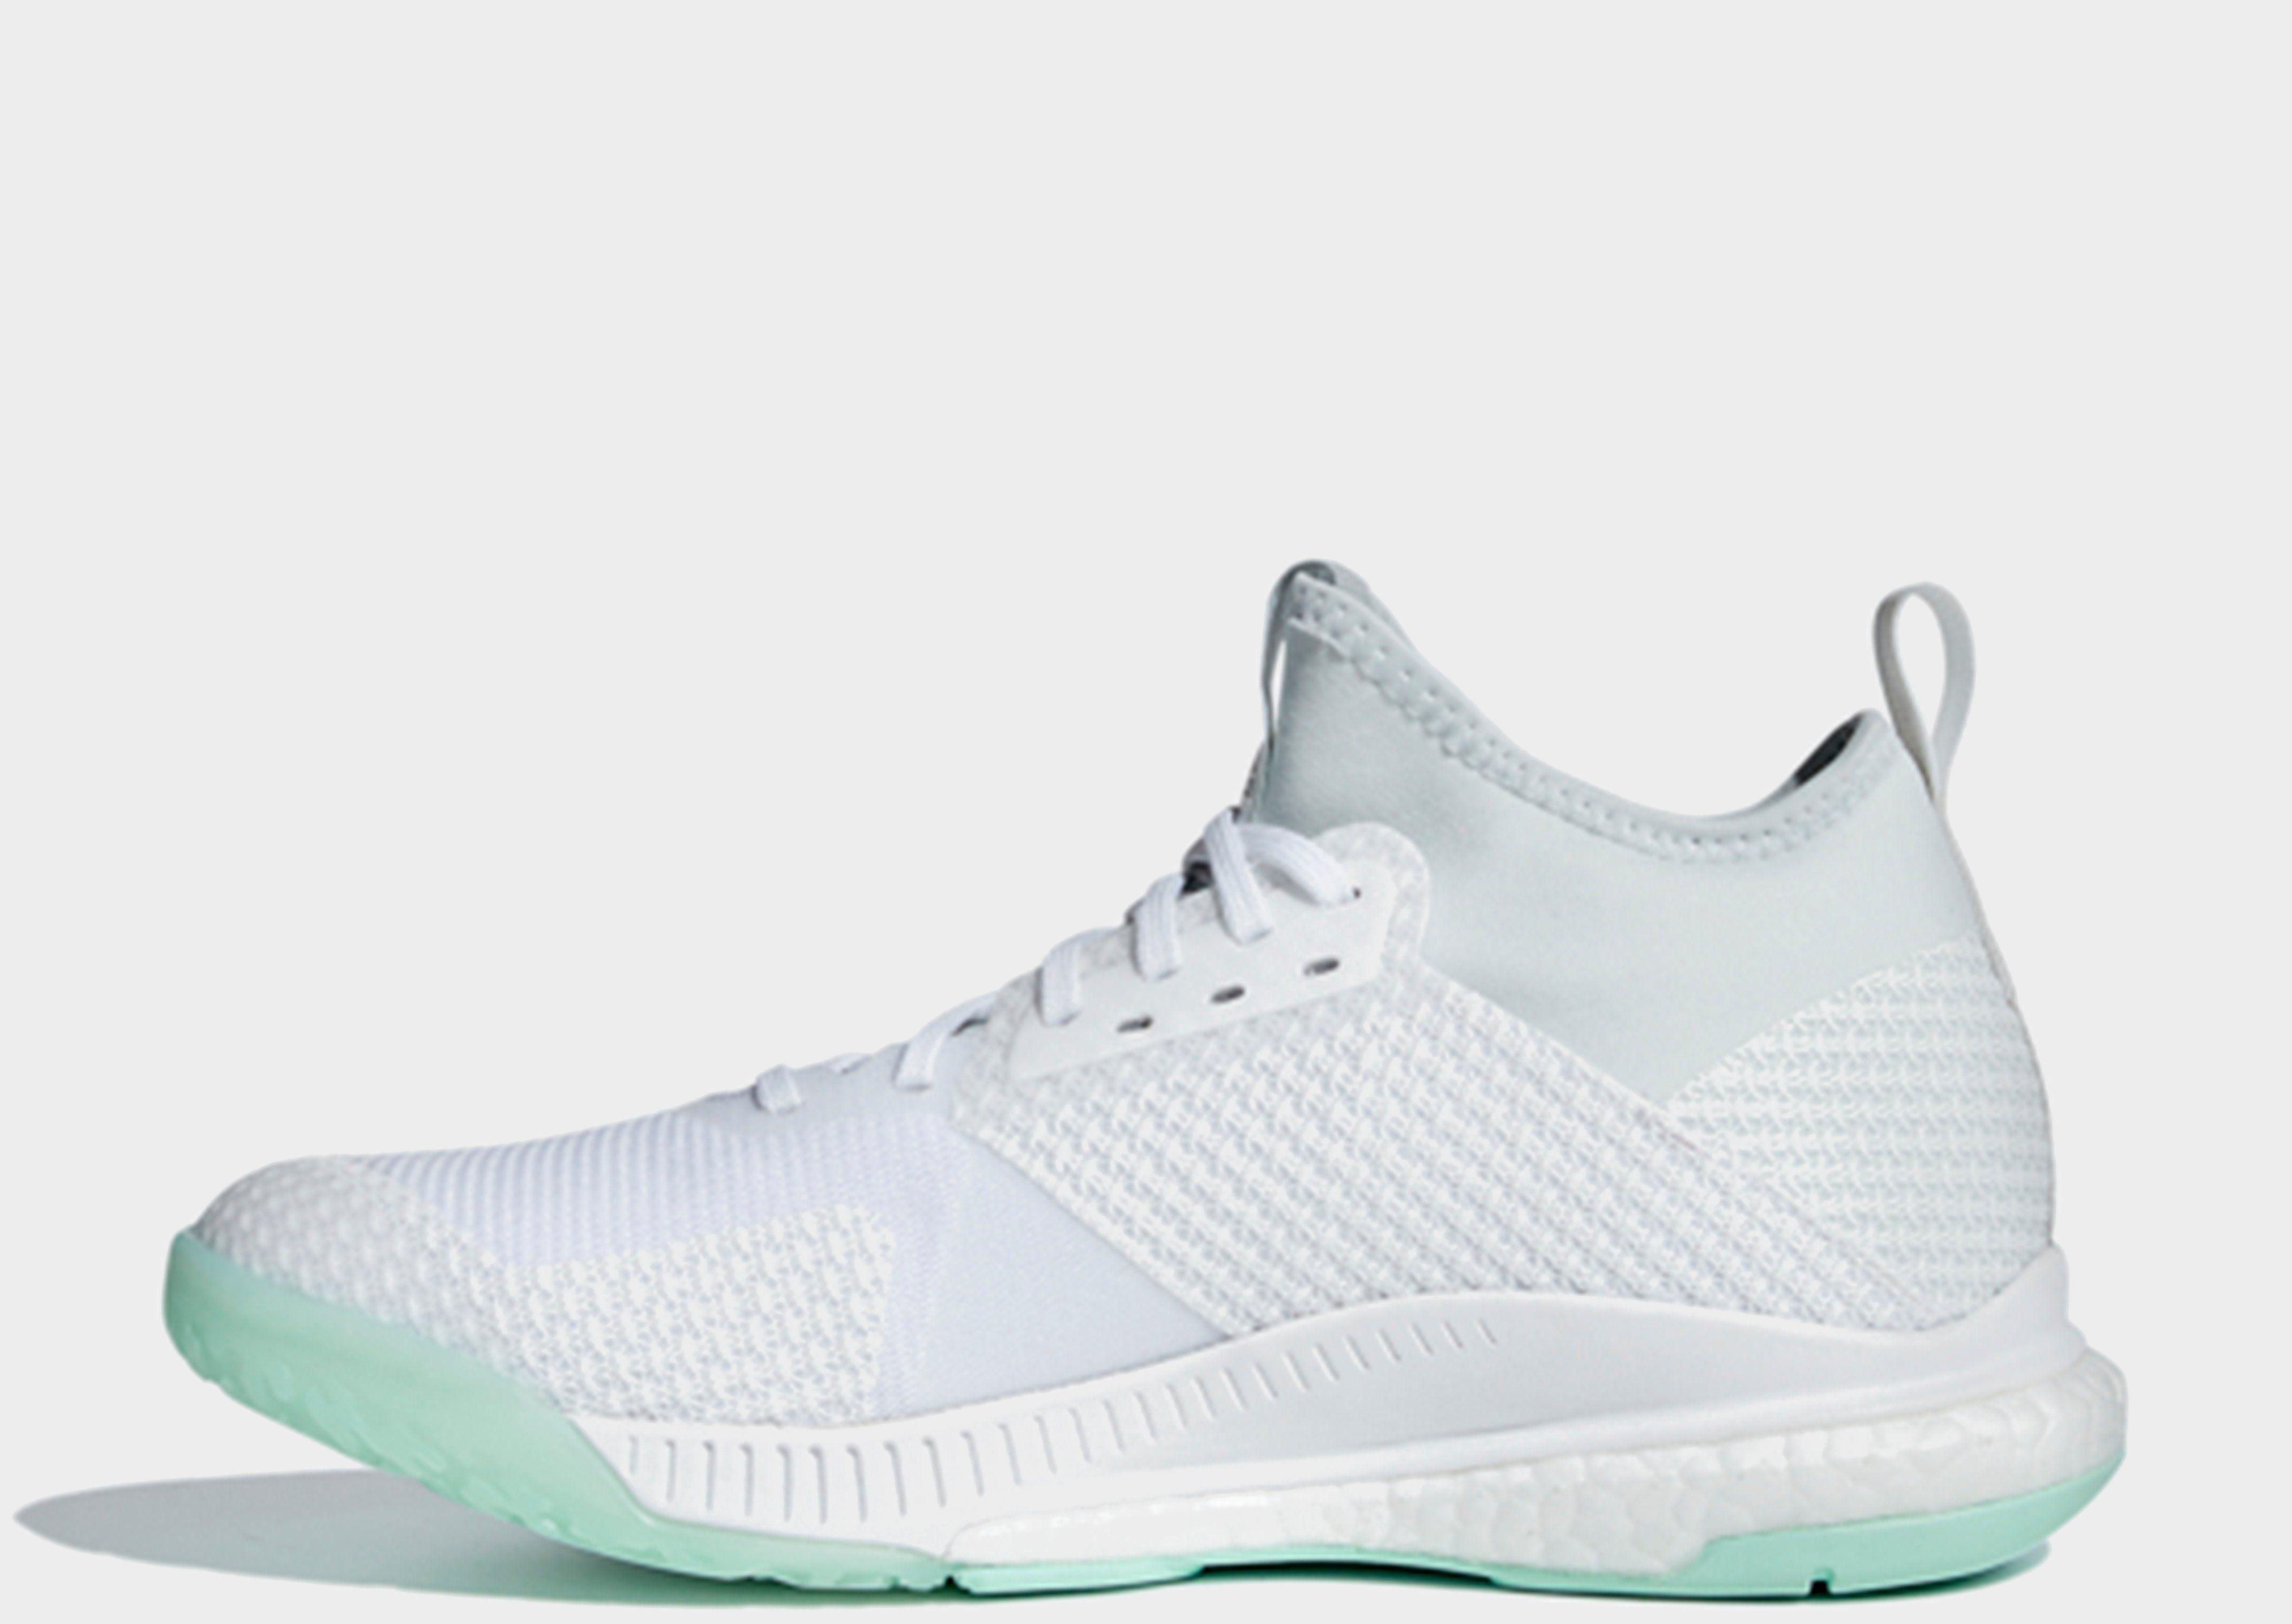 21d15eb6cc16e ADIDAS Crazyflight X 2.0 Mid Shoes